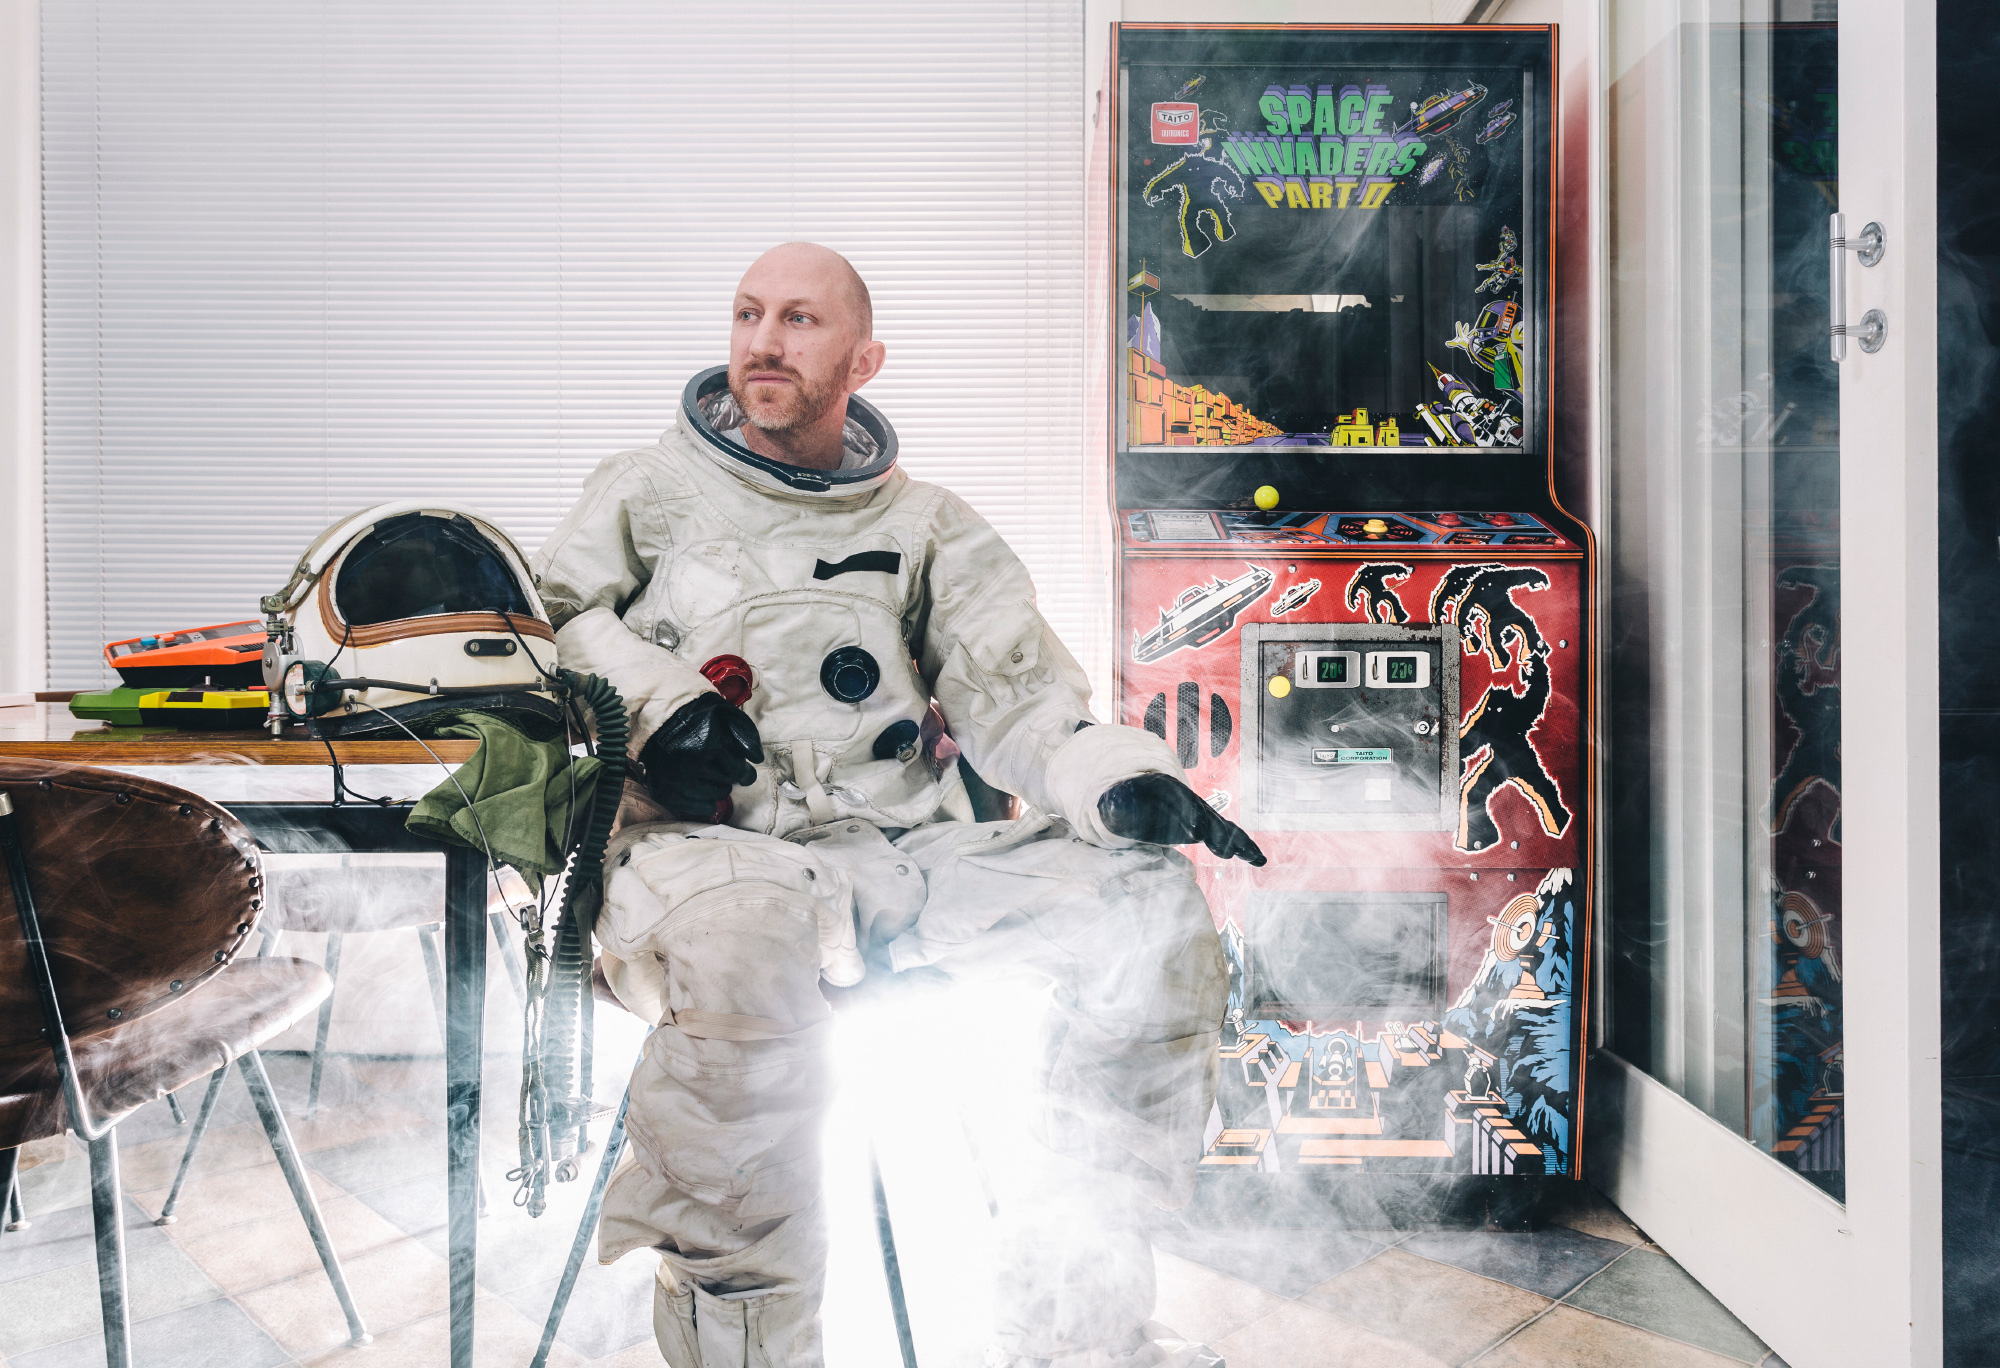 pluto_spaceman_mg_9552.jpg